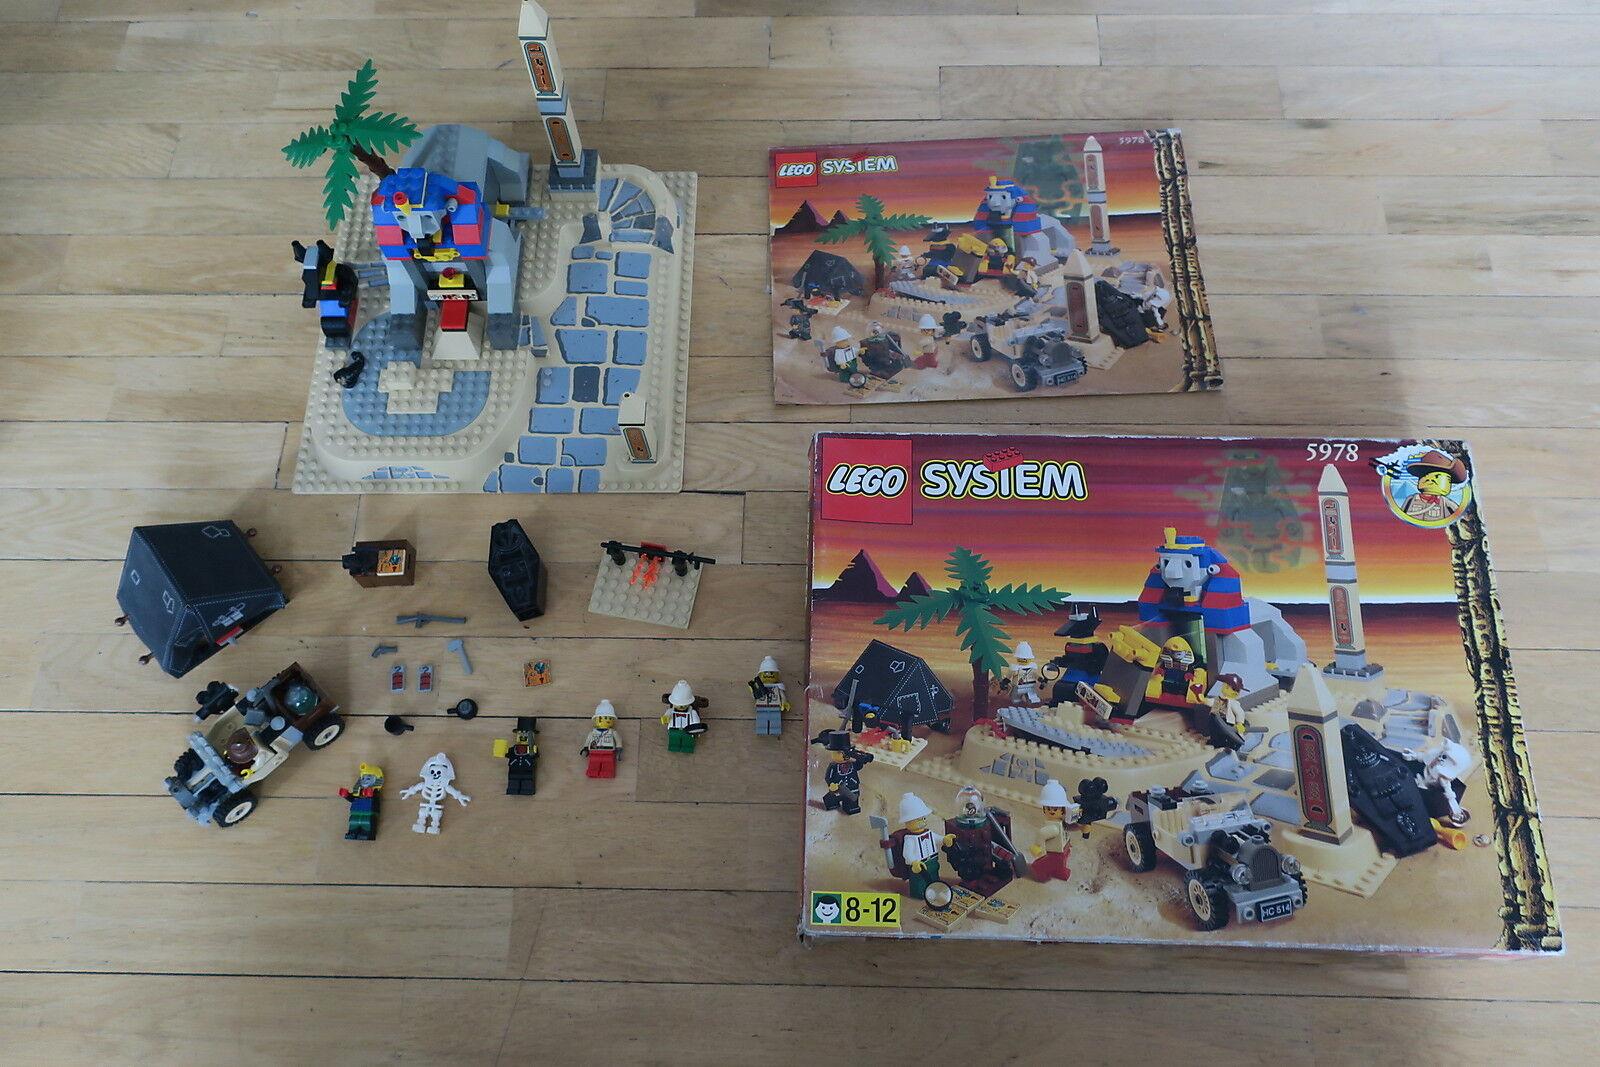 LEGO SYSTEM 5978 - AVVENTURIERI SPHYNX SECRET SORPRESA